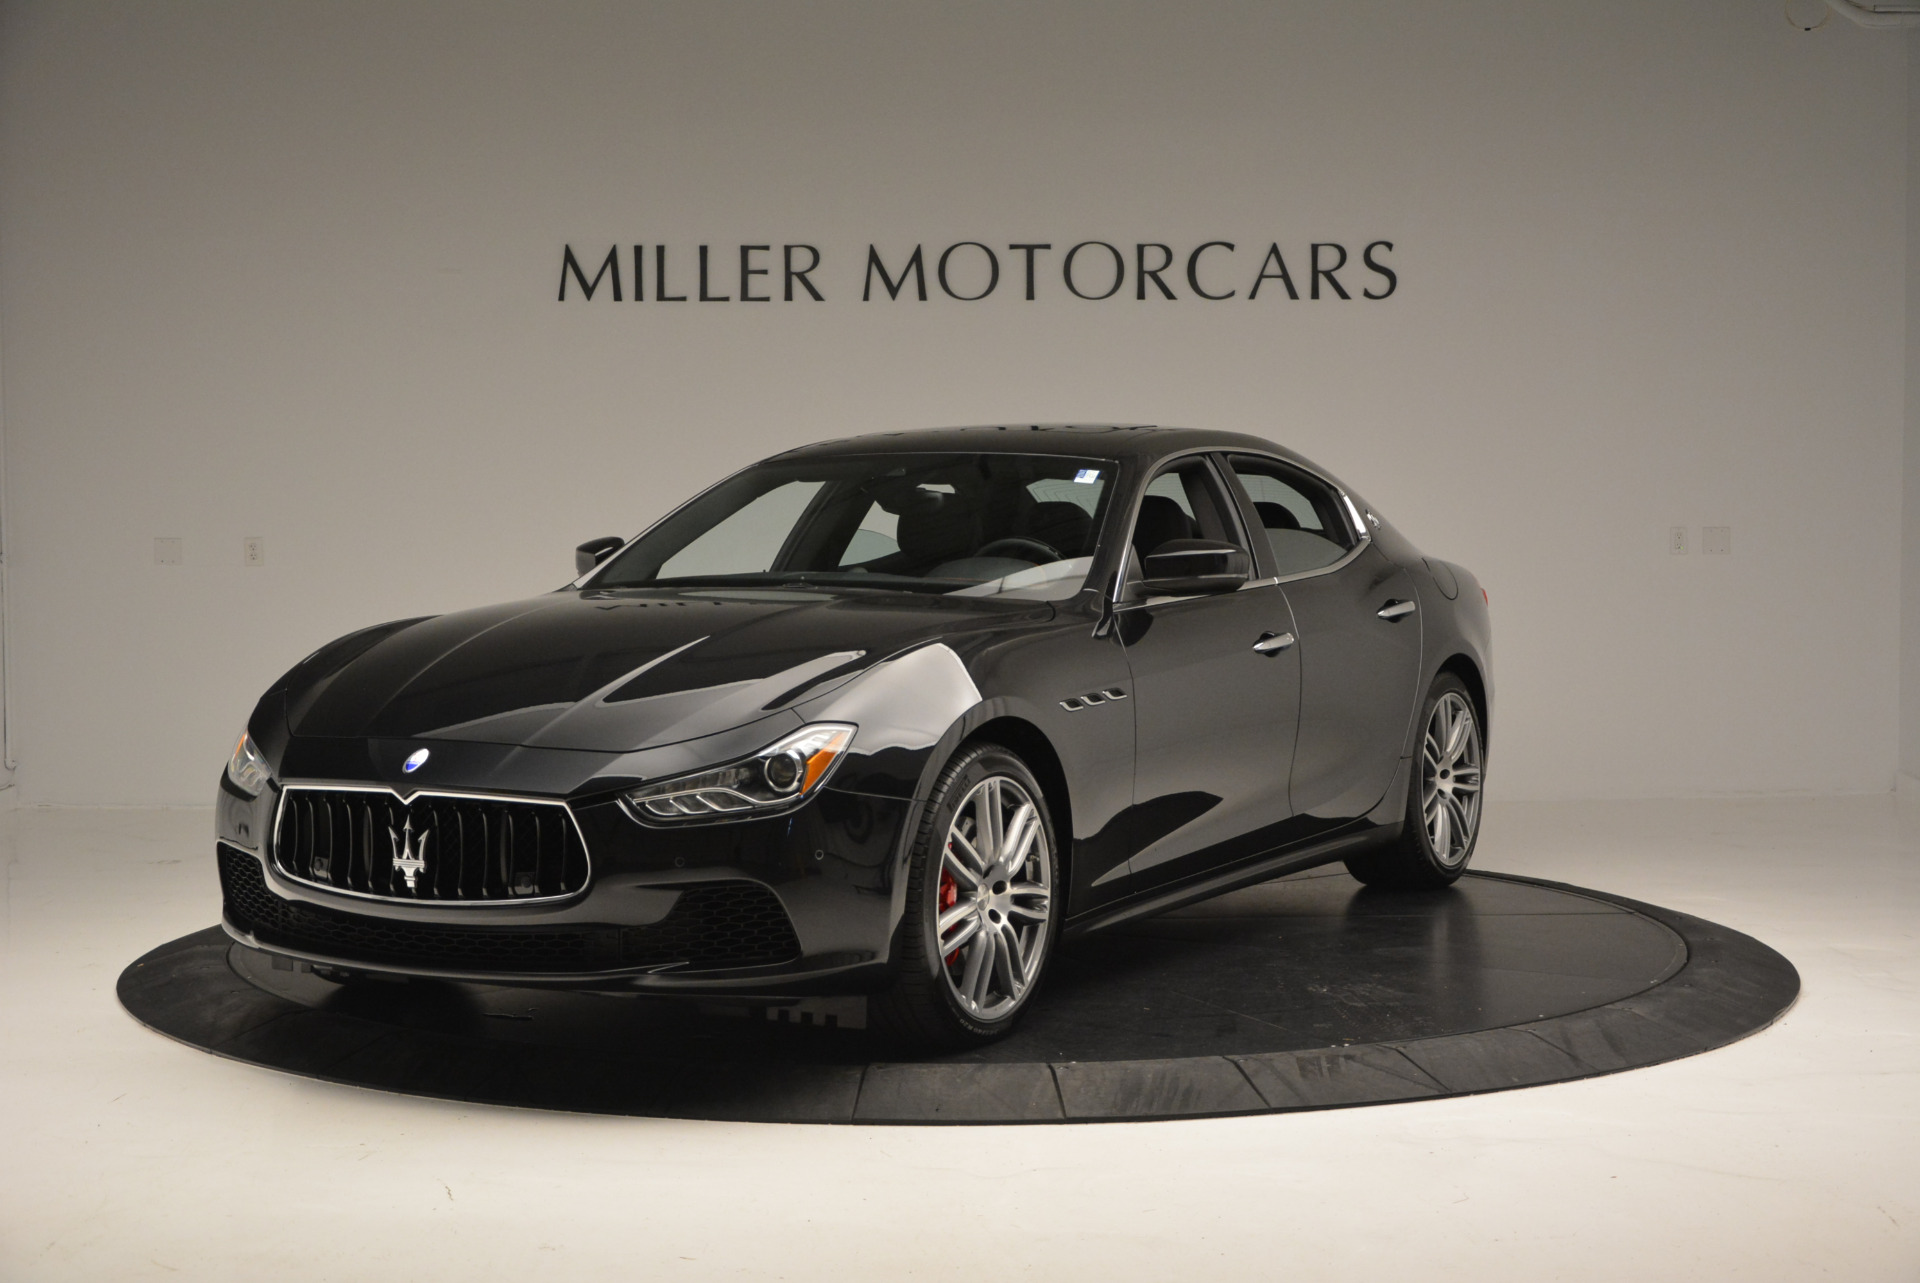 New 2017 Maserati Ghibli S Q4 For Sale In Greenwich, CT 566_main